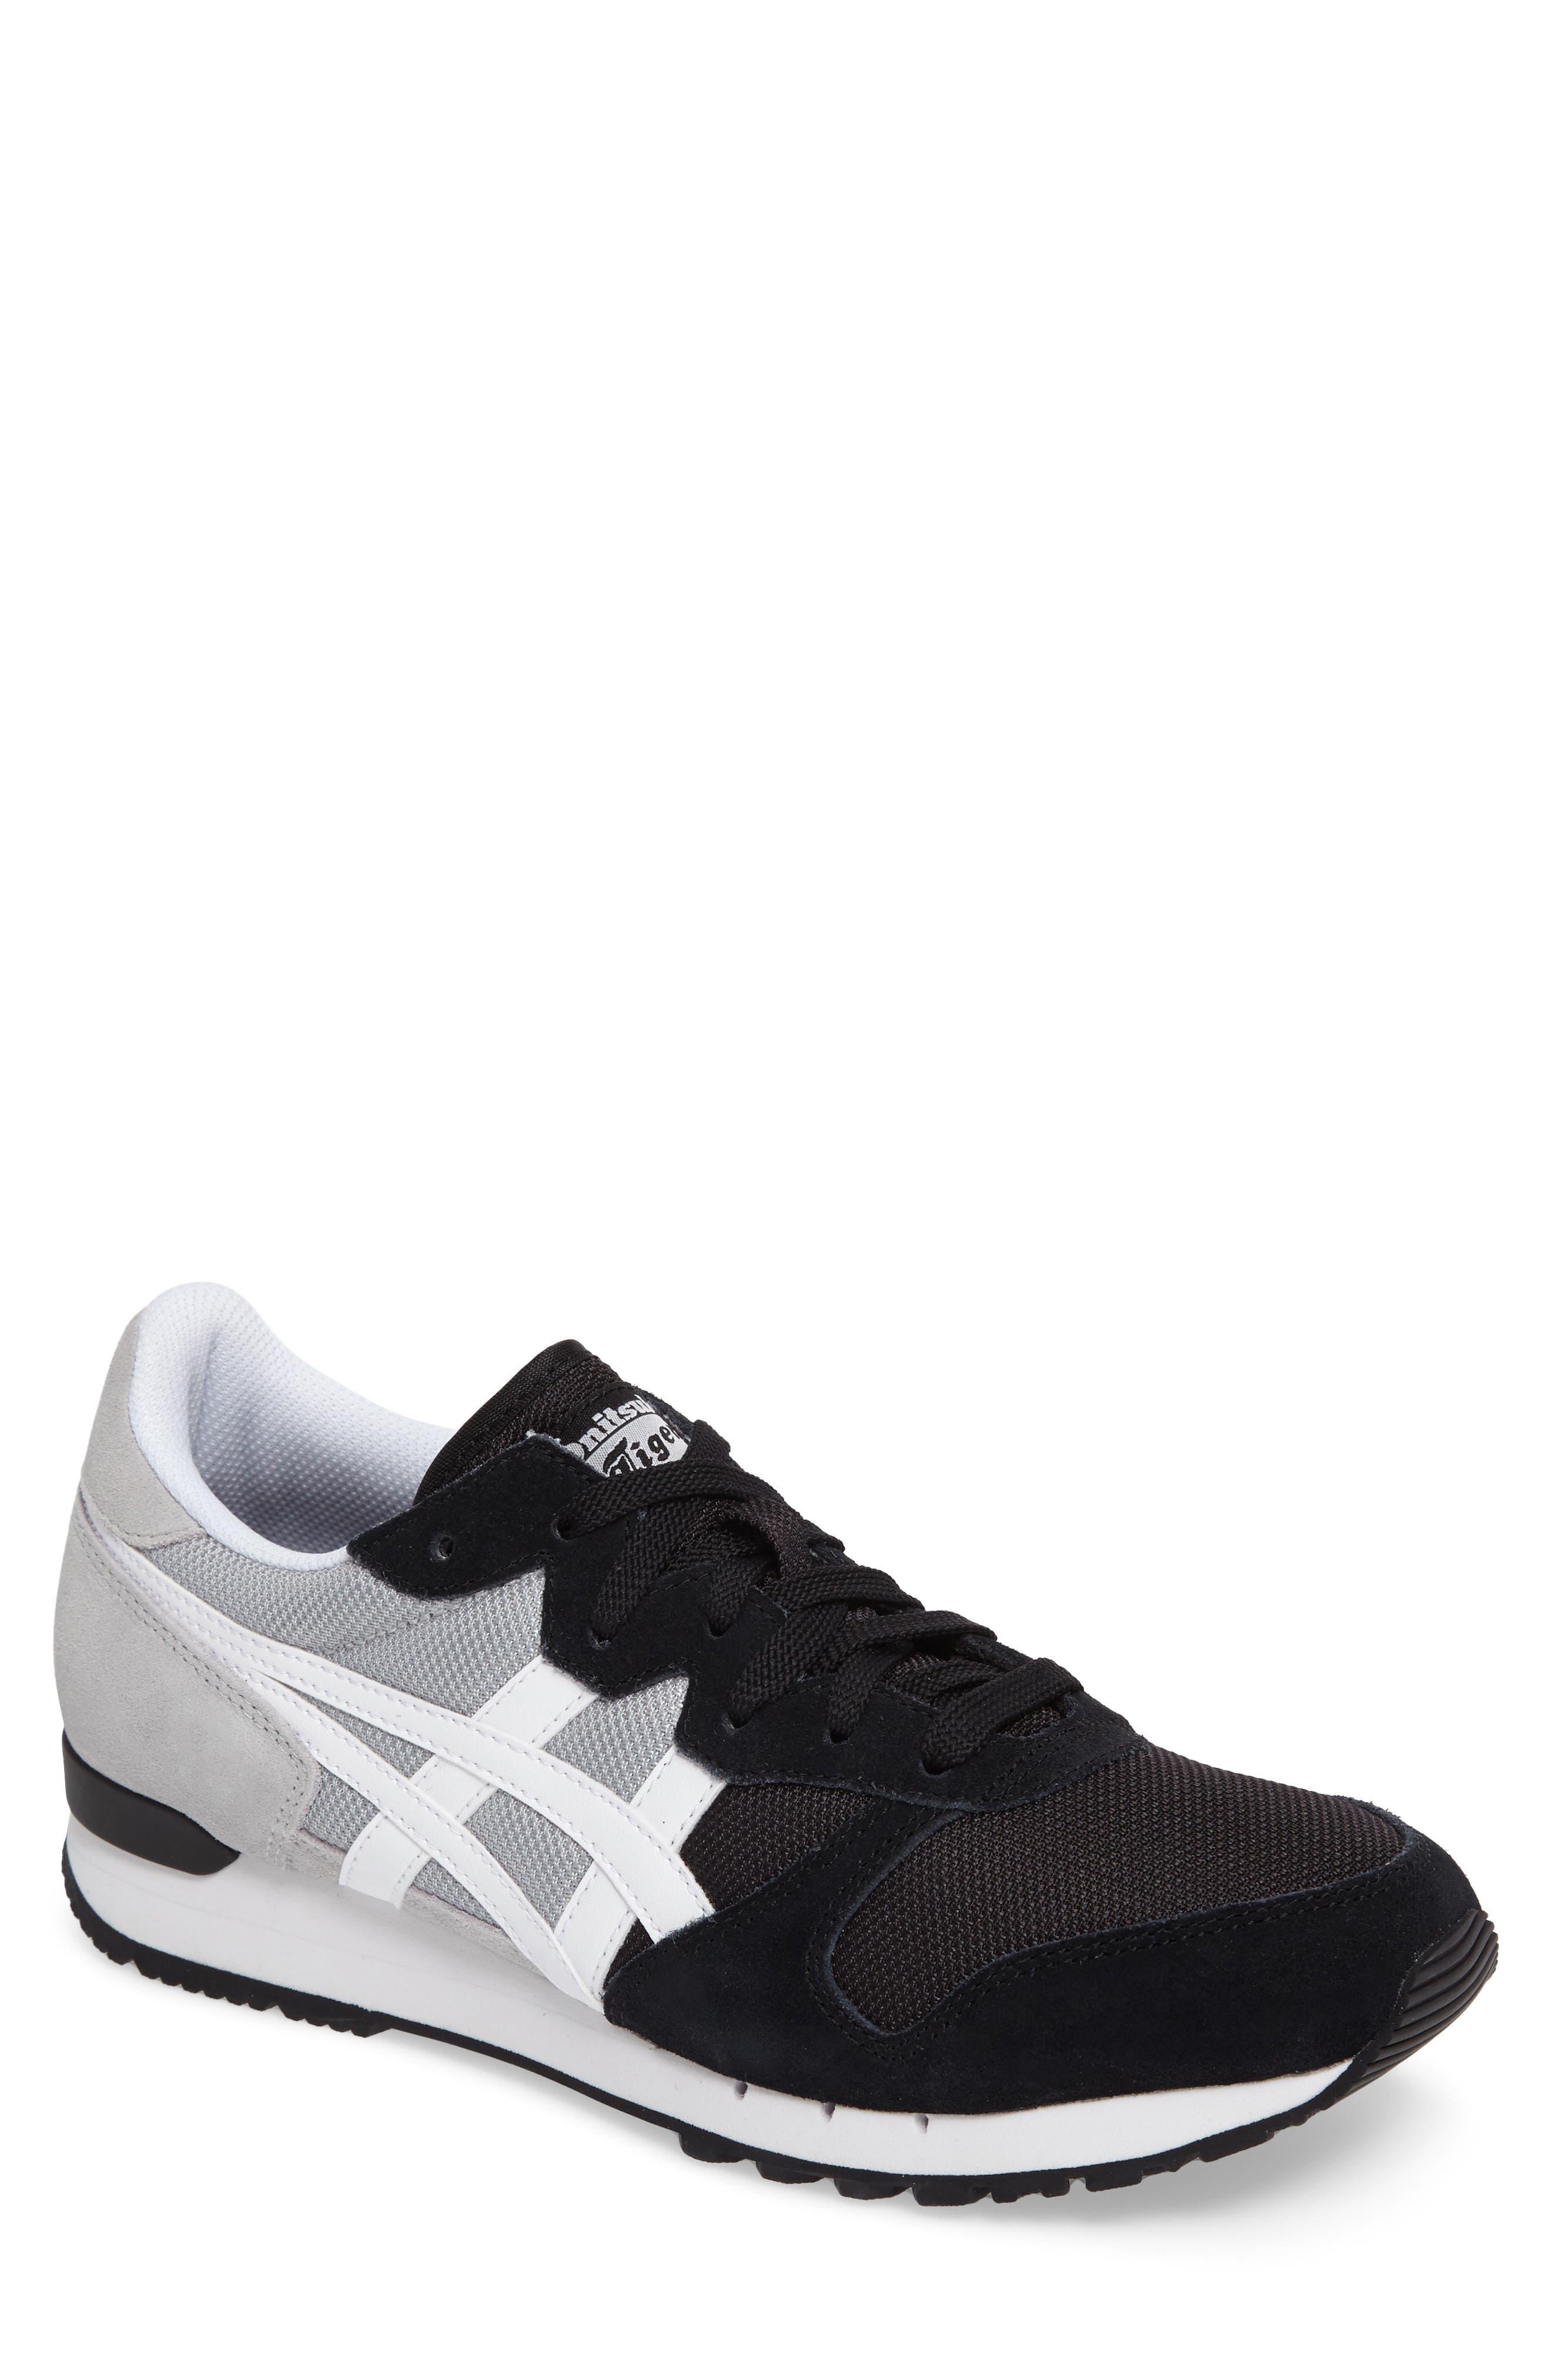 Onitsuka Tiger 'Alvarado' Sneaker,                         Main,                         color, Mid Grey/ White